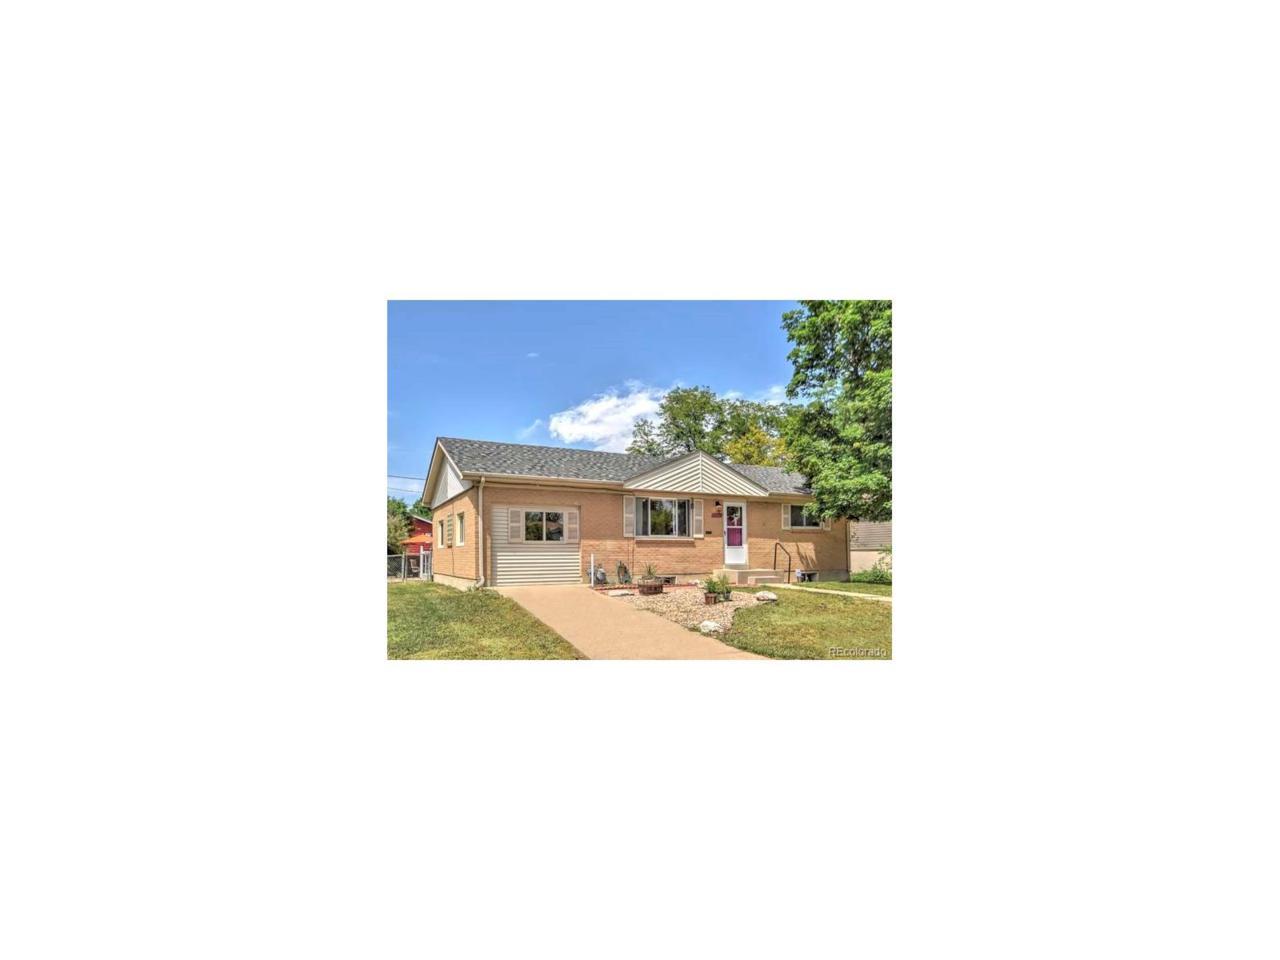 1481 Phillips Drive, Northglenn, CO 80233 (MLS #2411606) :: 8z Real Estate